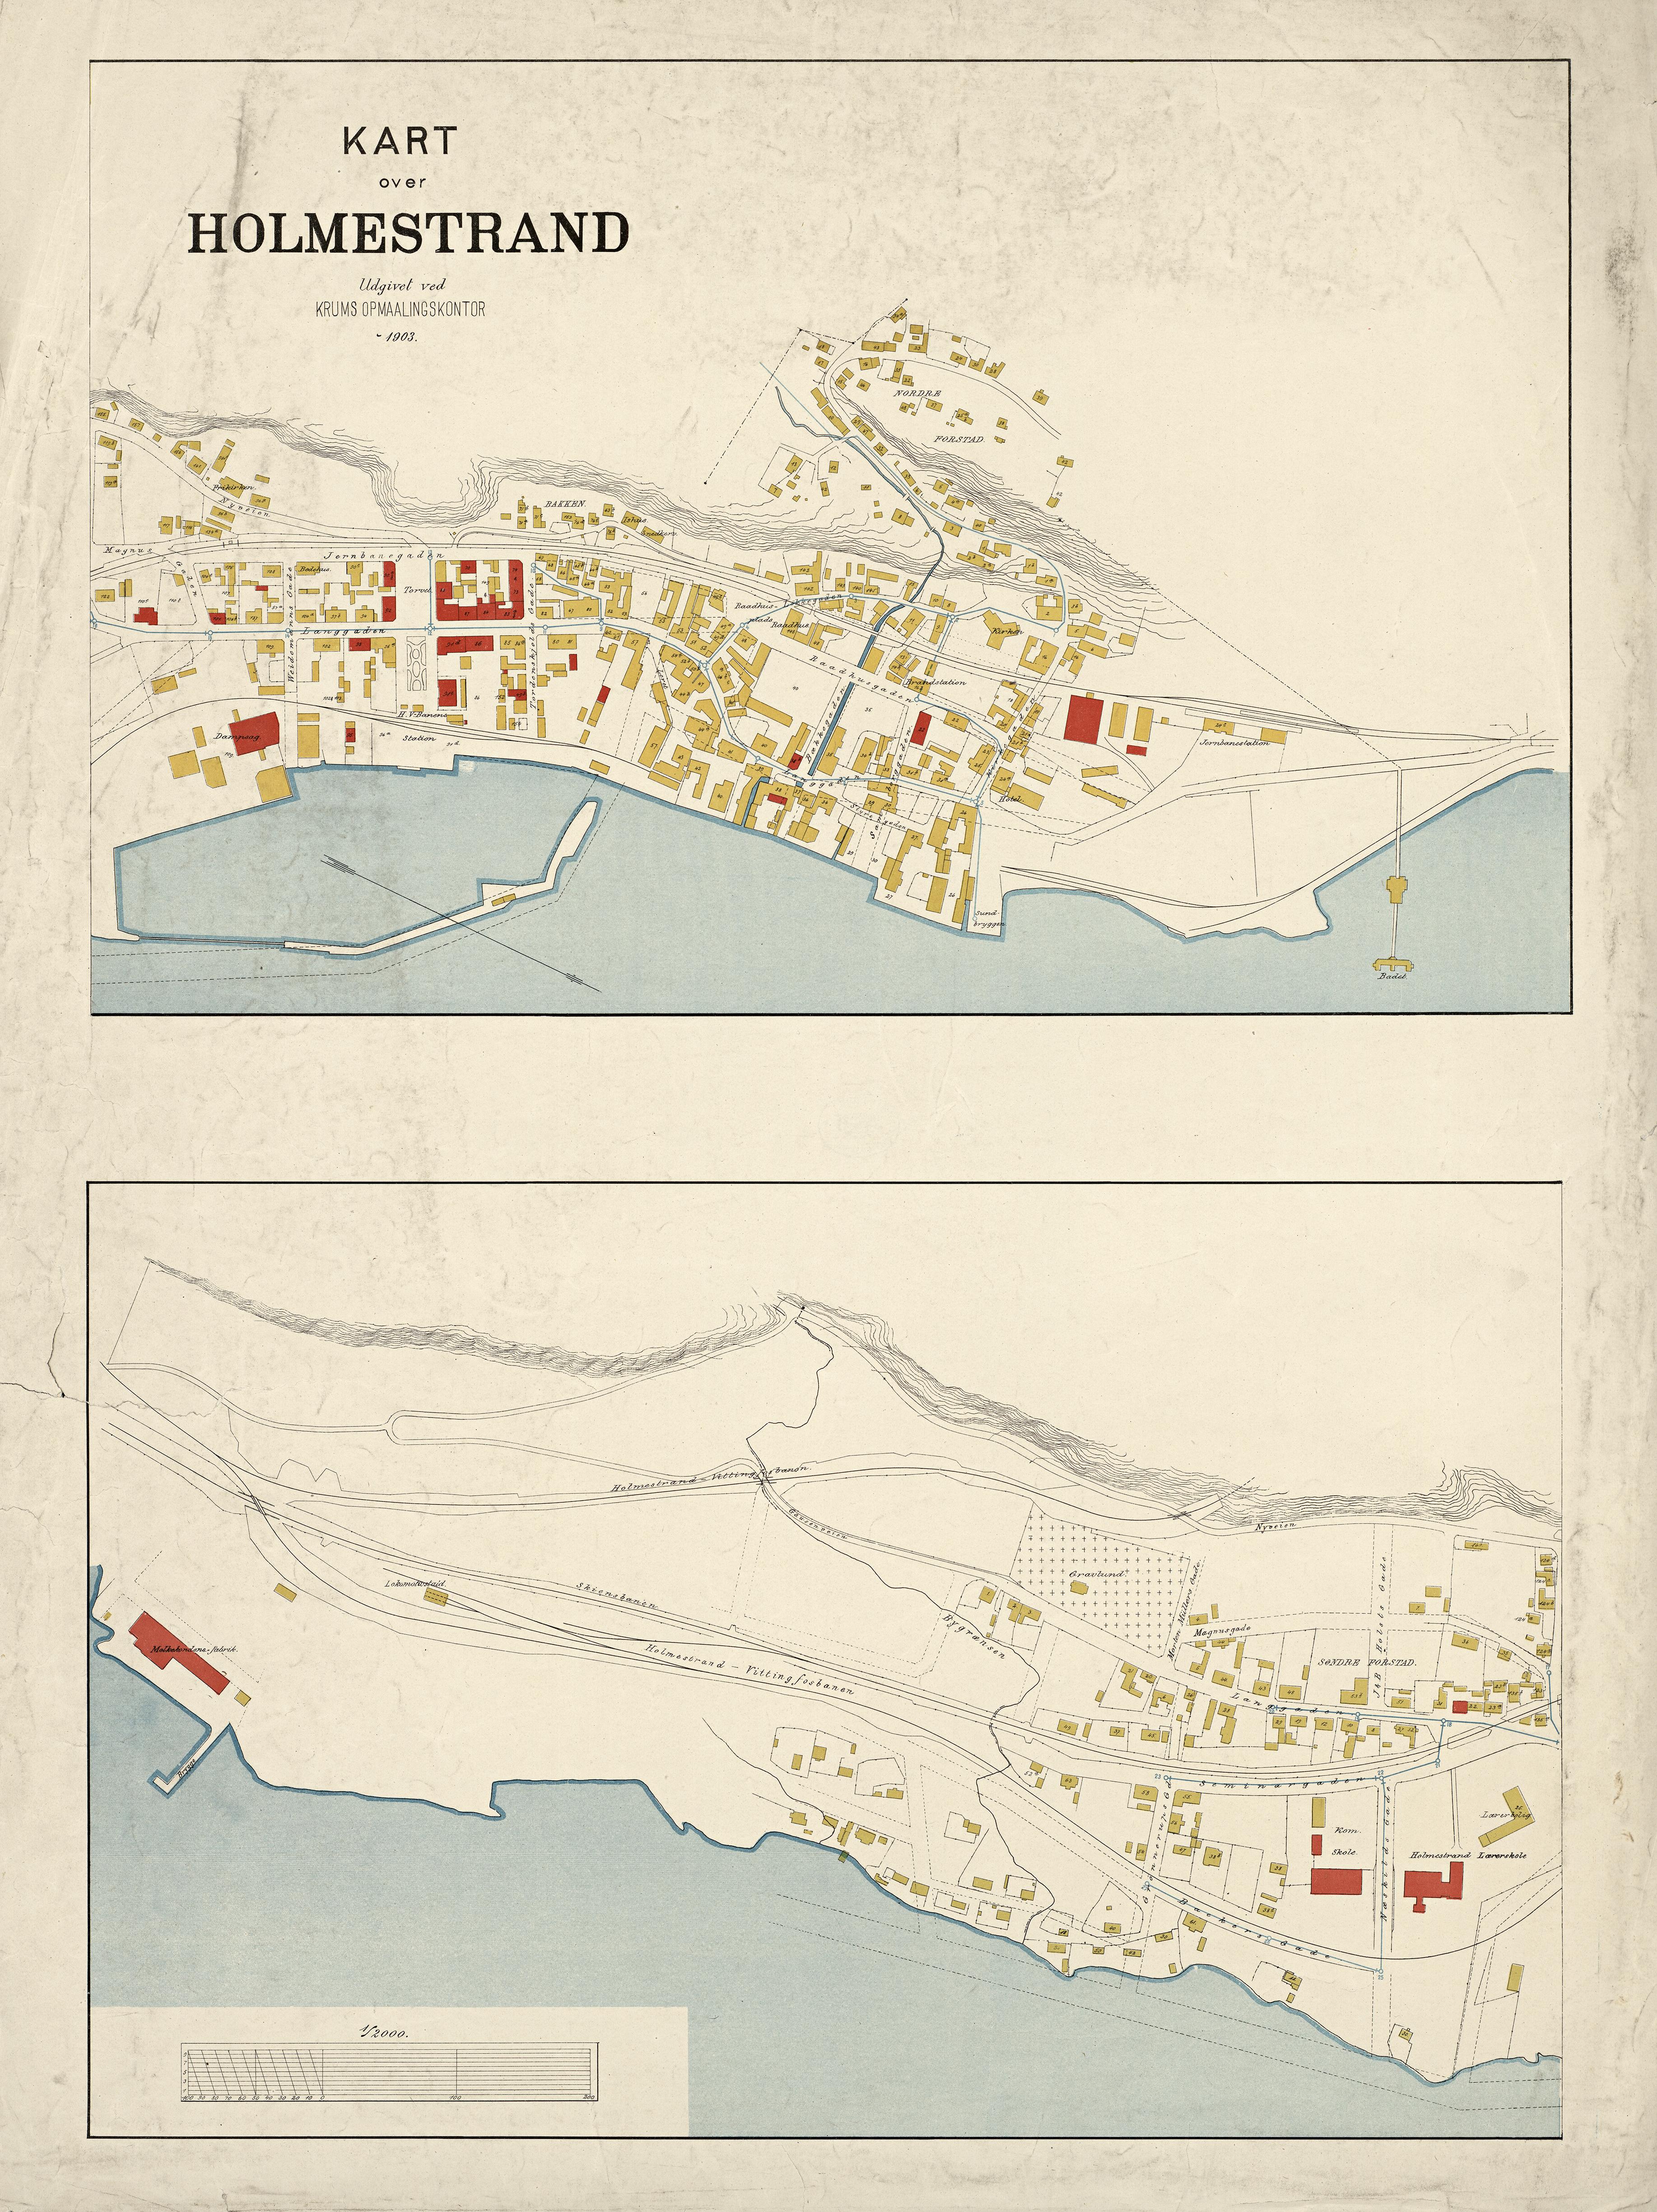 FileKart over Holmestrand 1903 Nonb krt 01289jpg Wikimedia